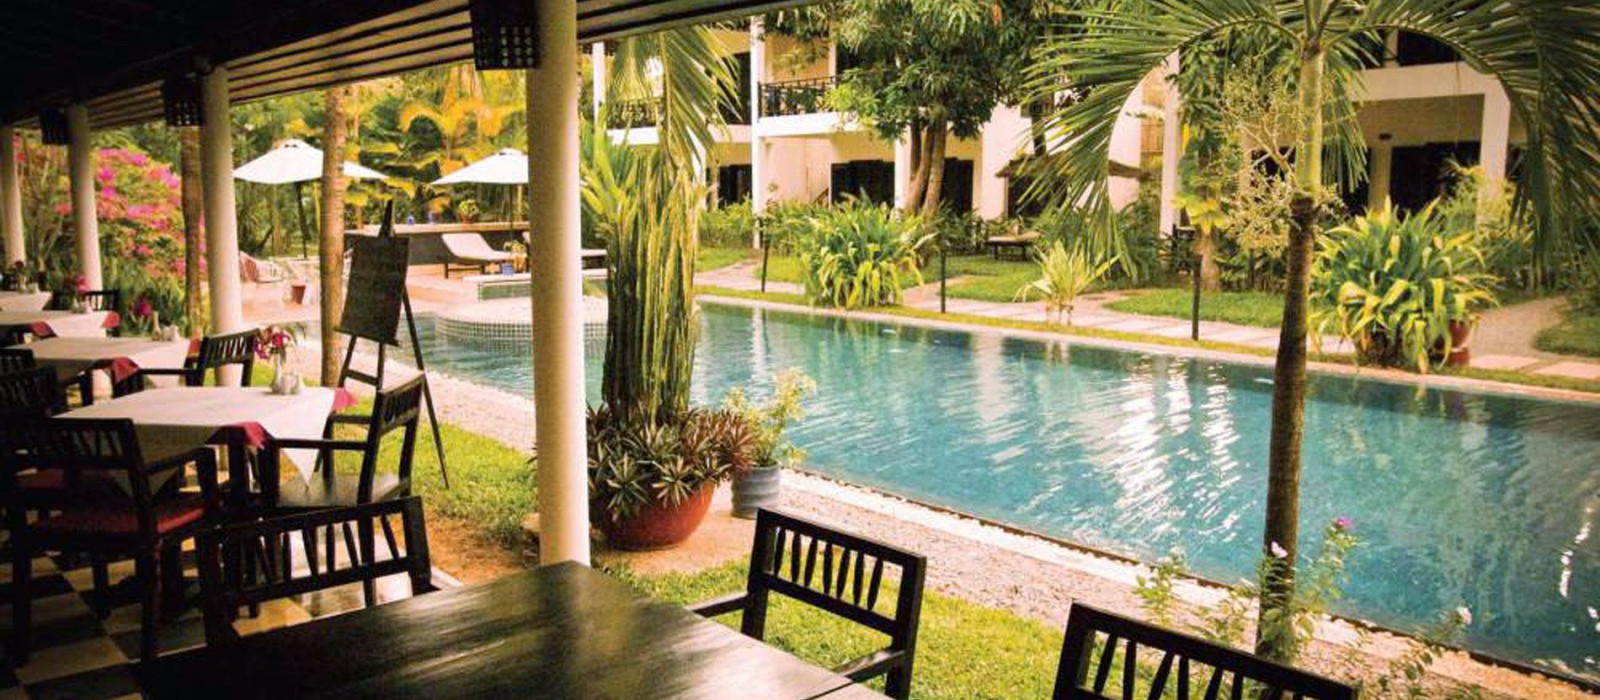 Hotel La Maison d'Angkor Kambodscha